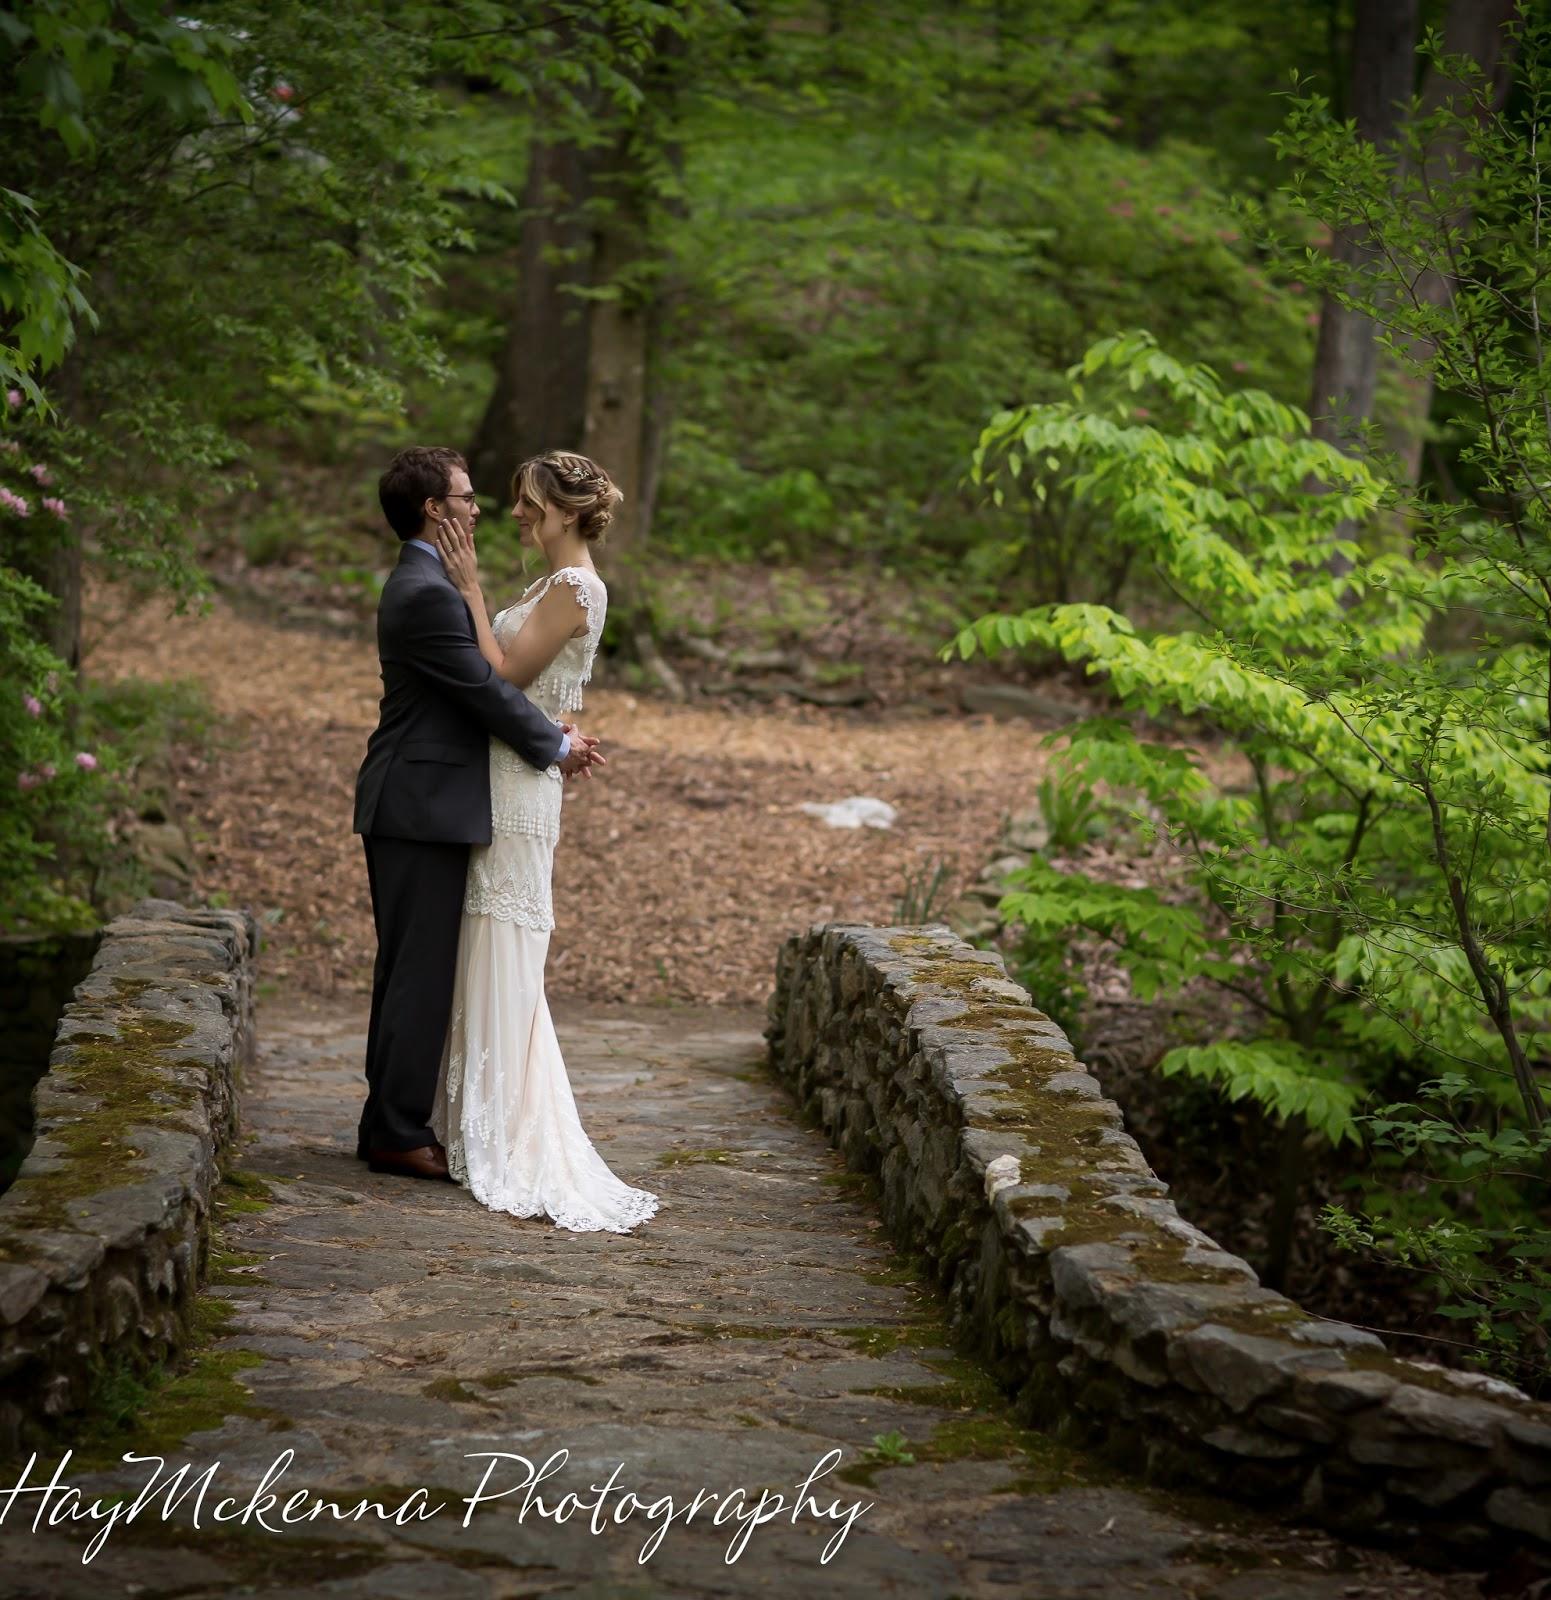 HayMckenna Photography: Outdoor Wedding In The Woods At